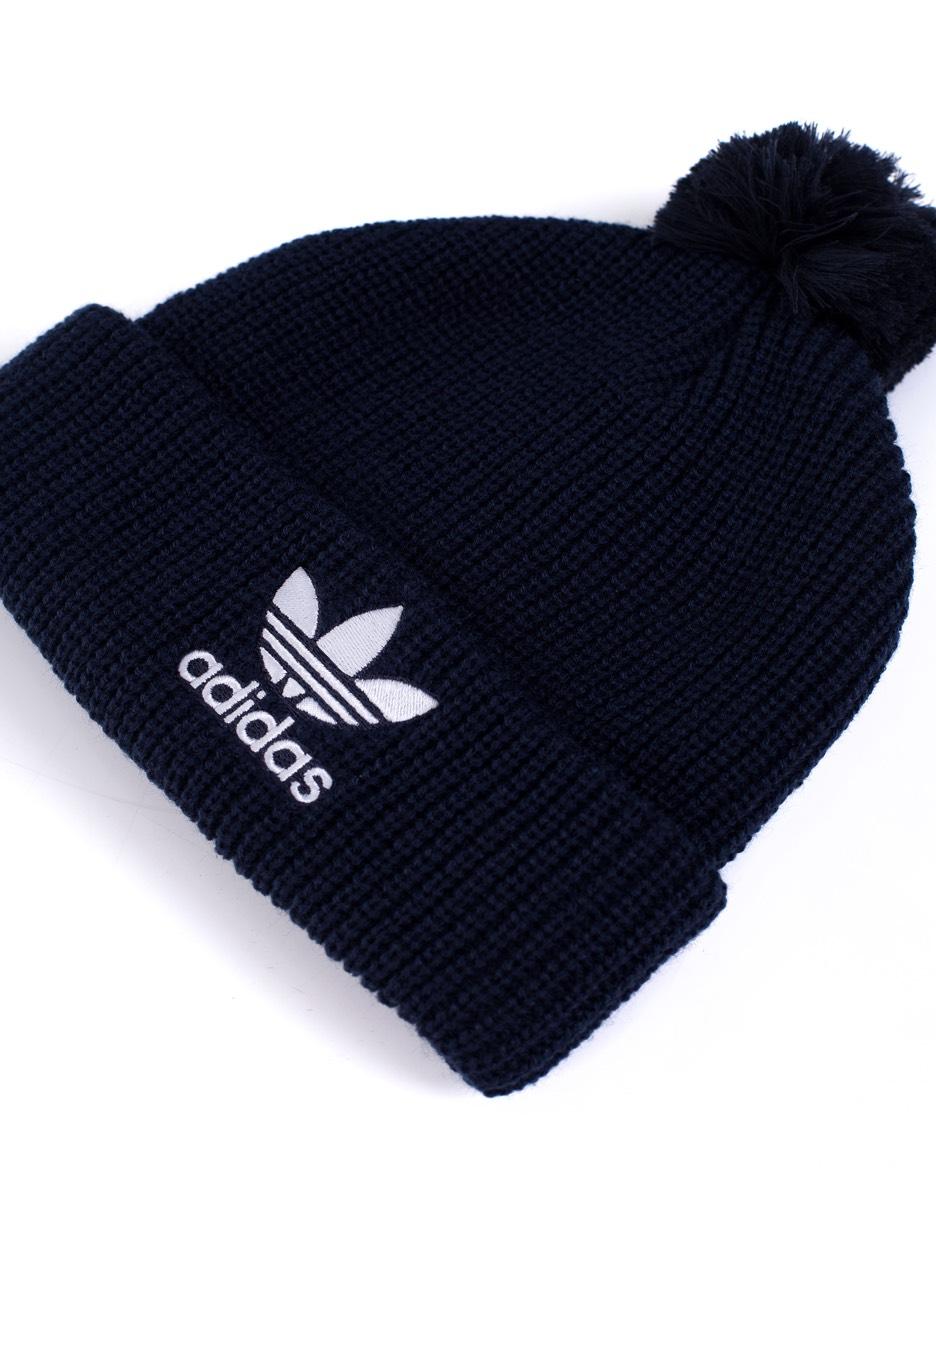 Adidas - Pom Pom Collegiate Navy - Muts - Streetwear Shop ... bc67651f3d3